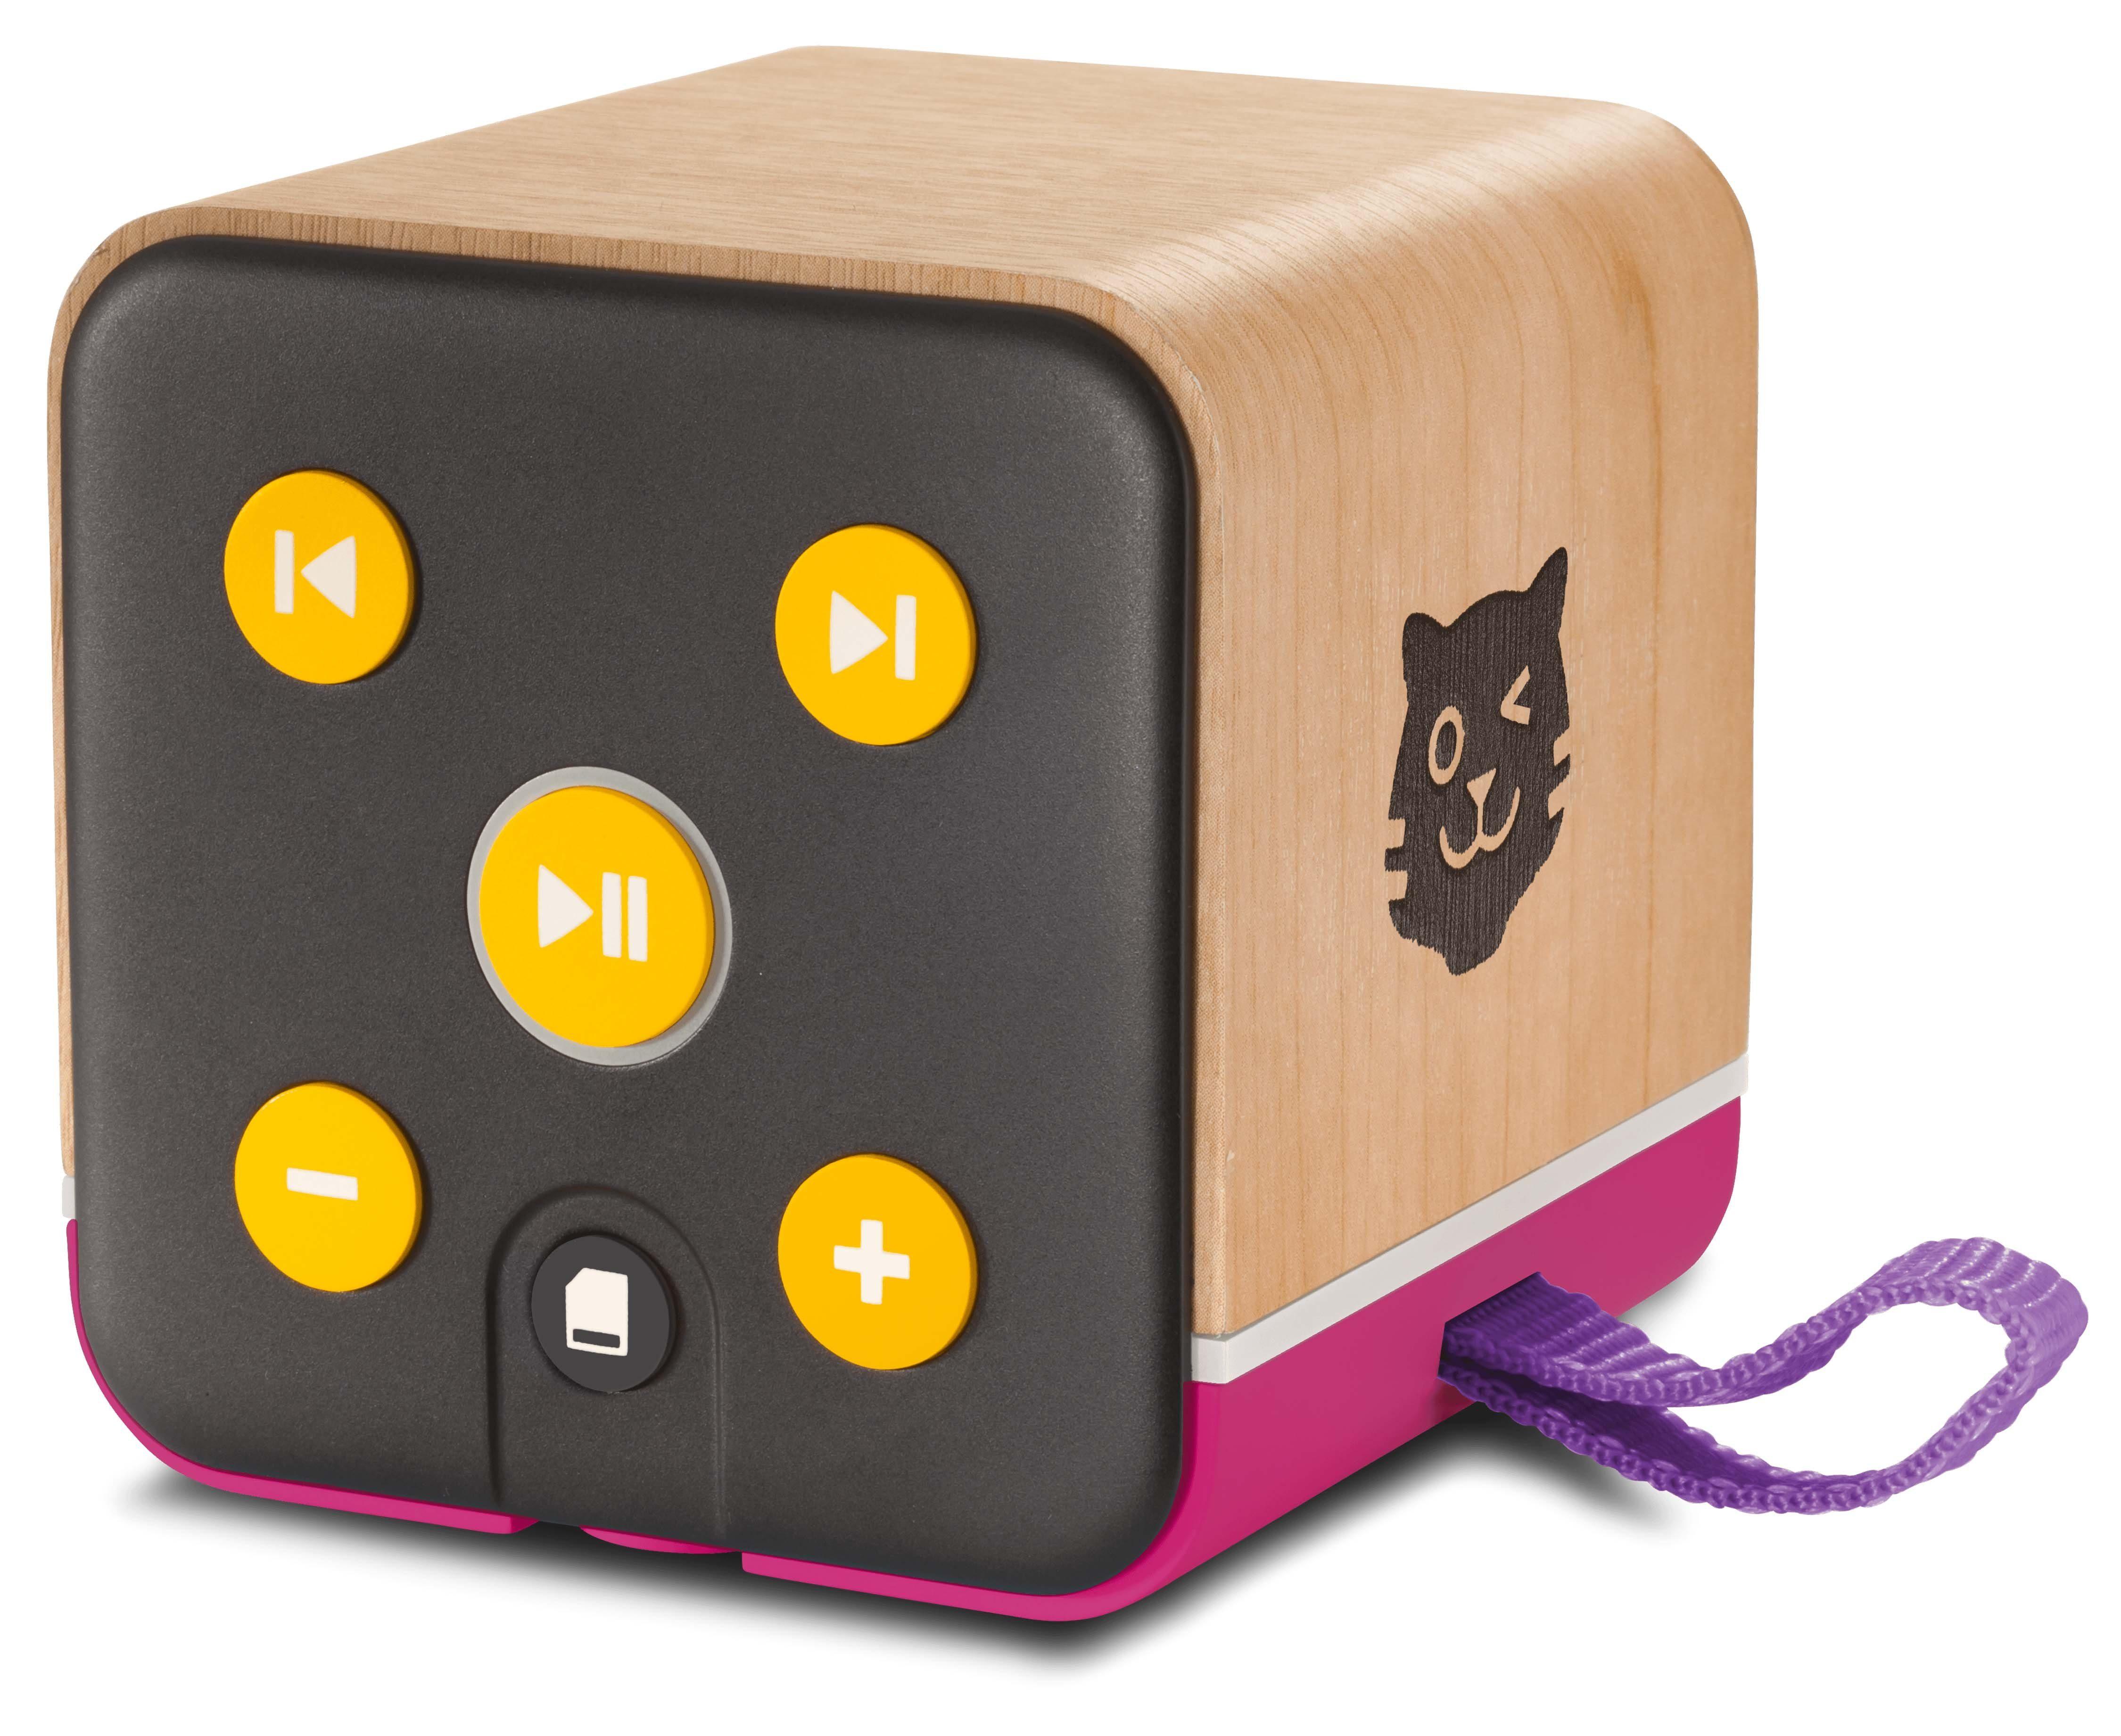 Lenco Mobiler Bluetooth-Lautsprecher mit Hörspiel »TigerBox - Bibi & Tina«